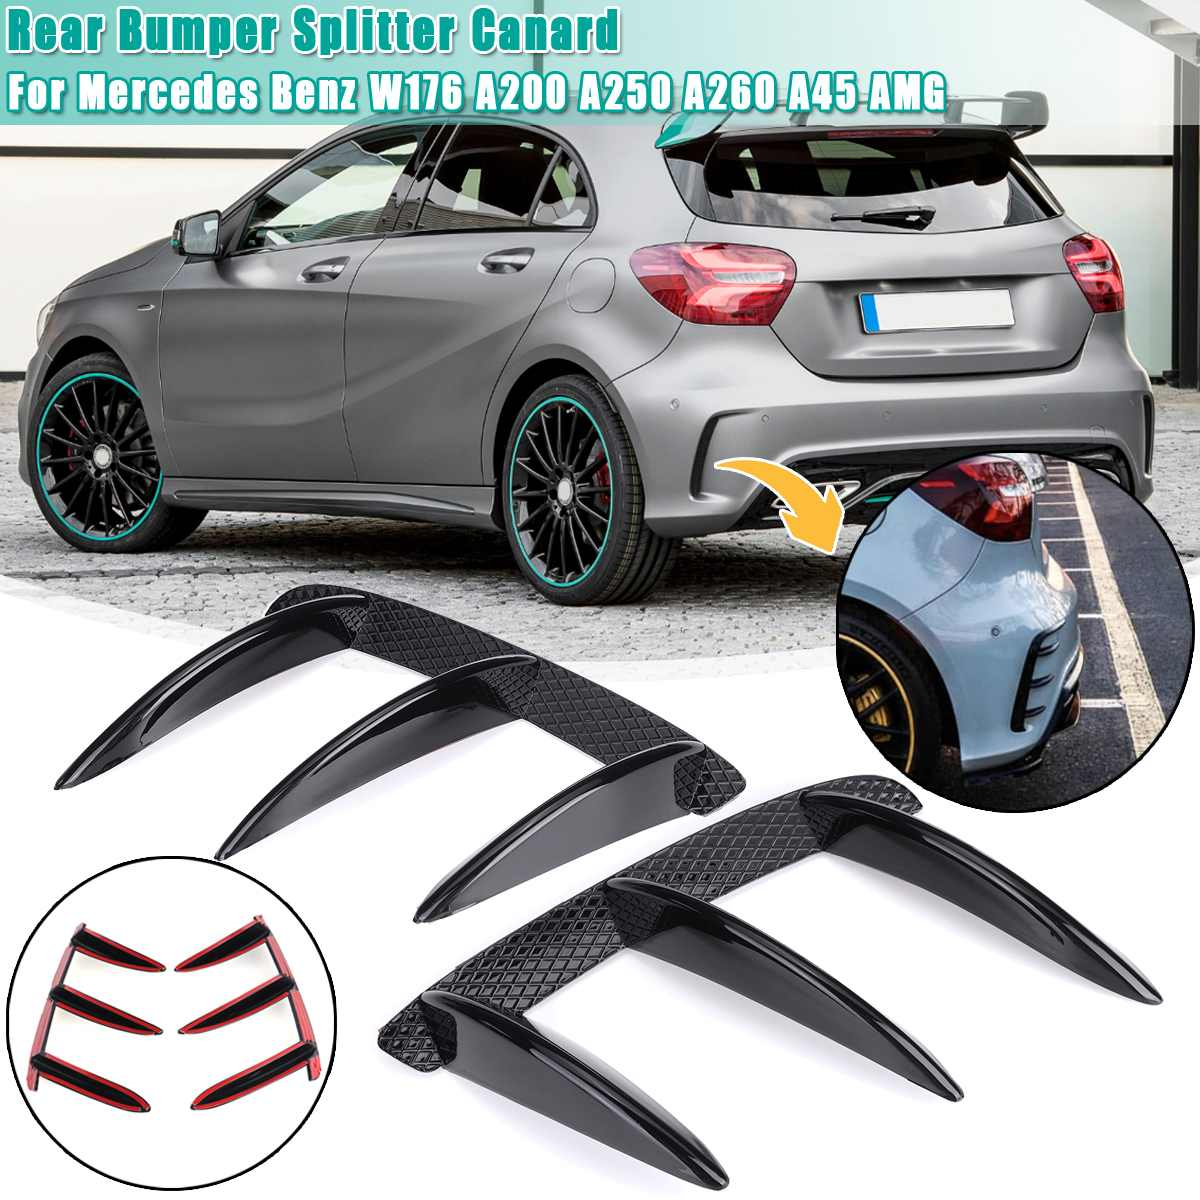 2 uds W176 Splitter parachoques trasero Canards Spoiler para Mercedes Benz para W176 A200 A250 A260 A45 para AMG paquete ABS negro